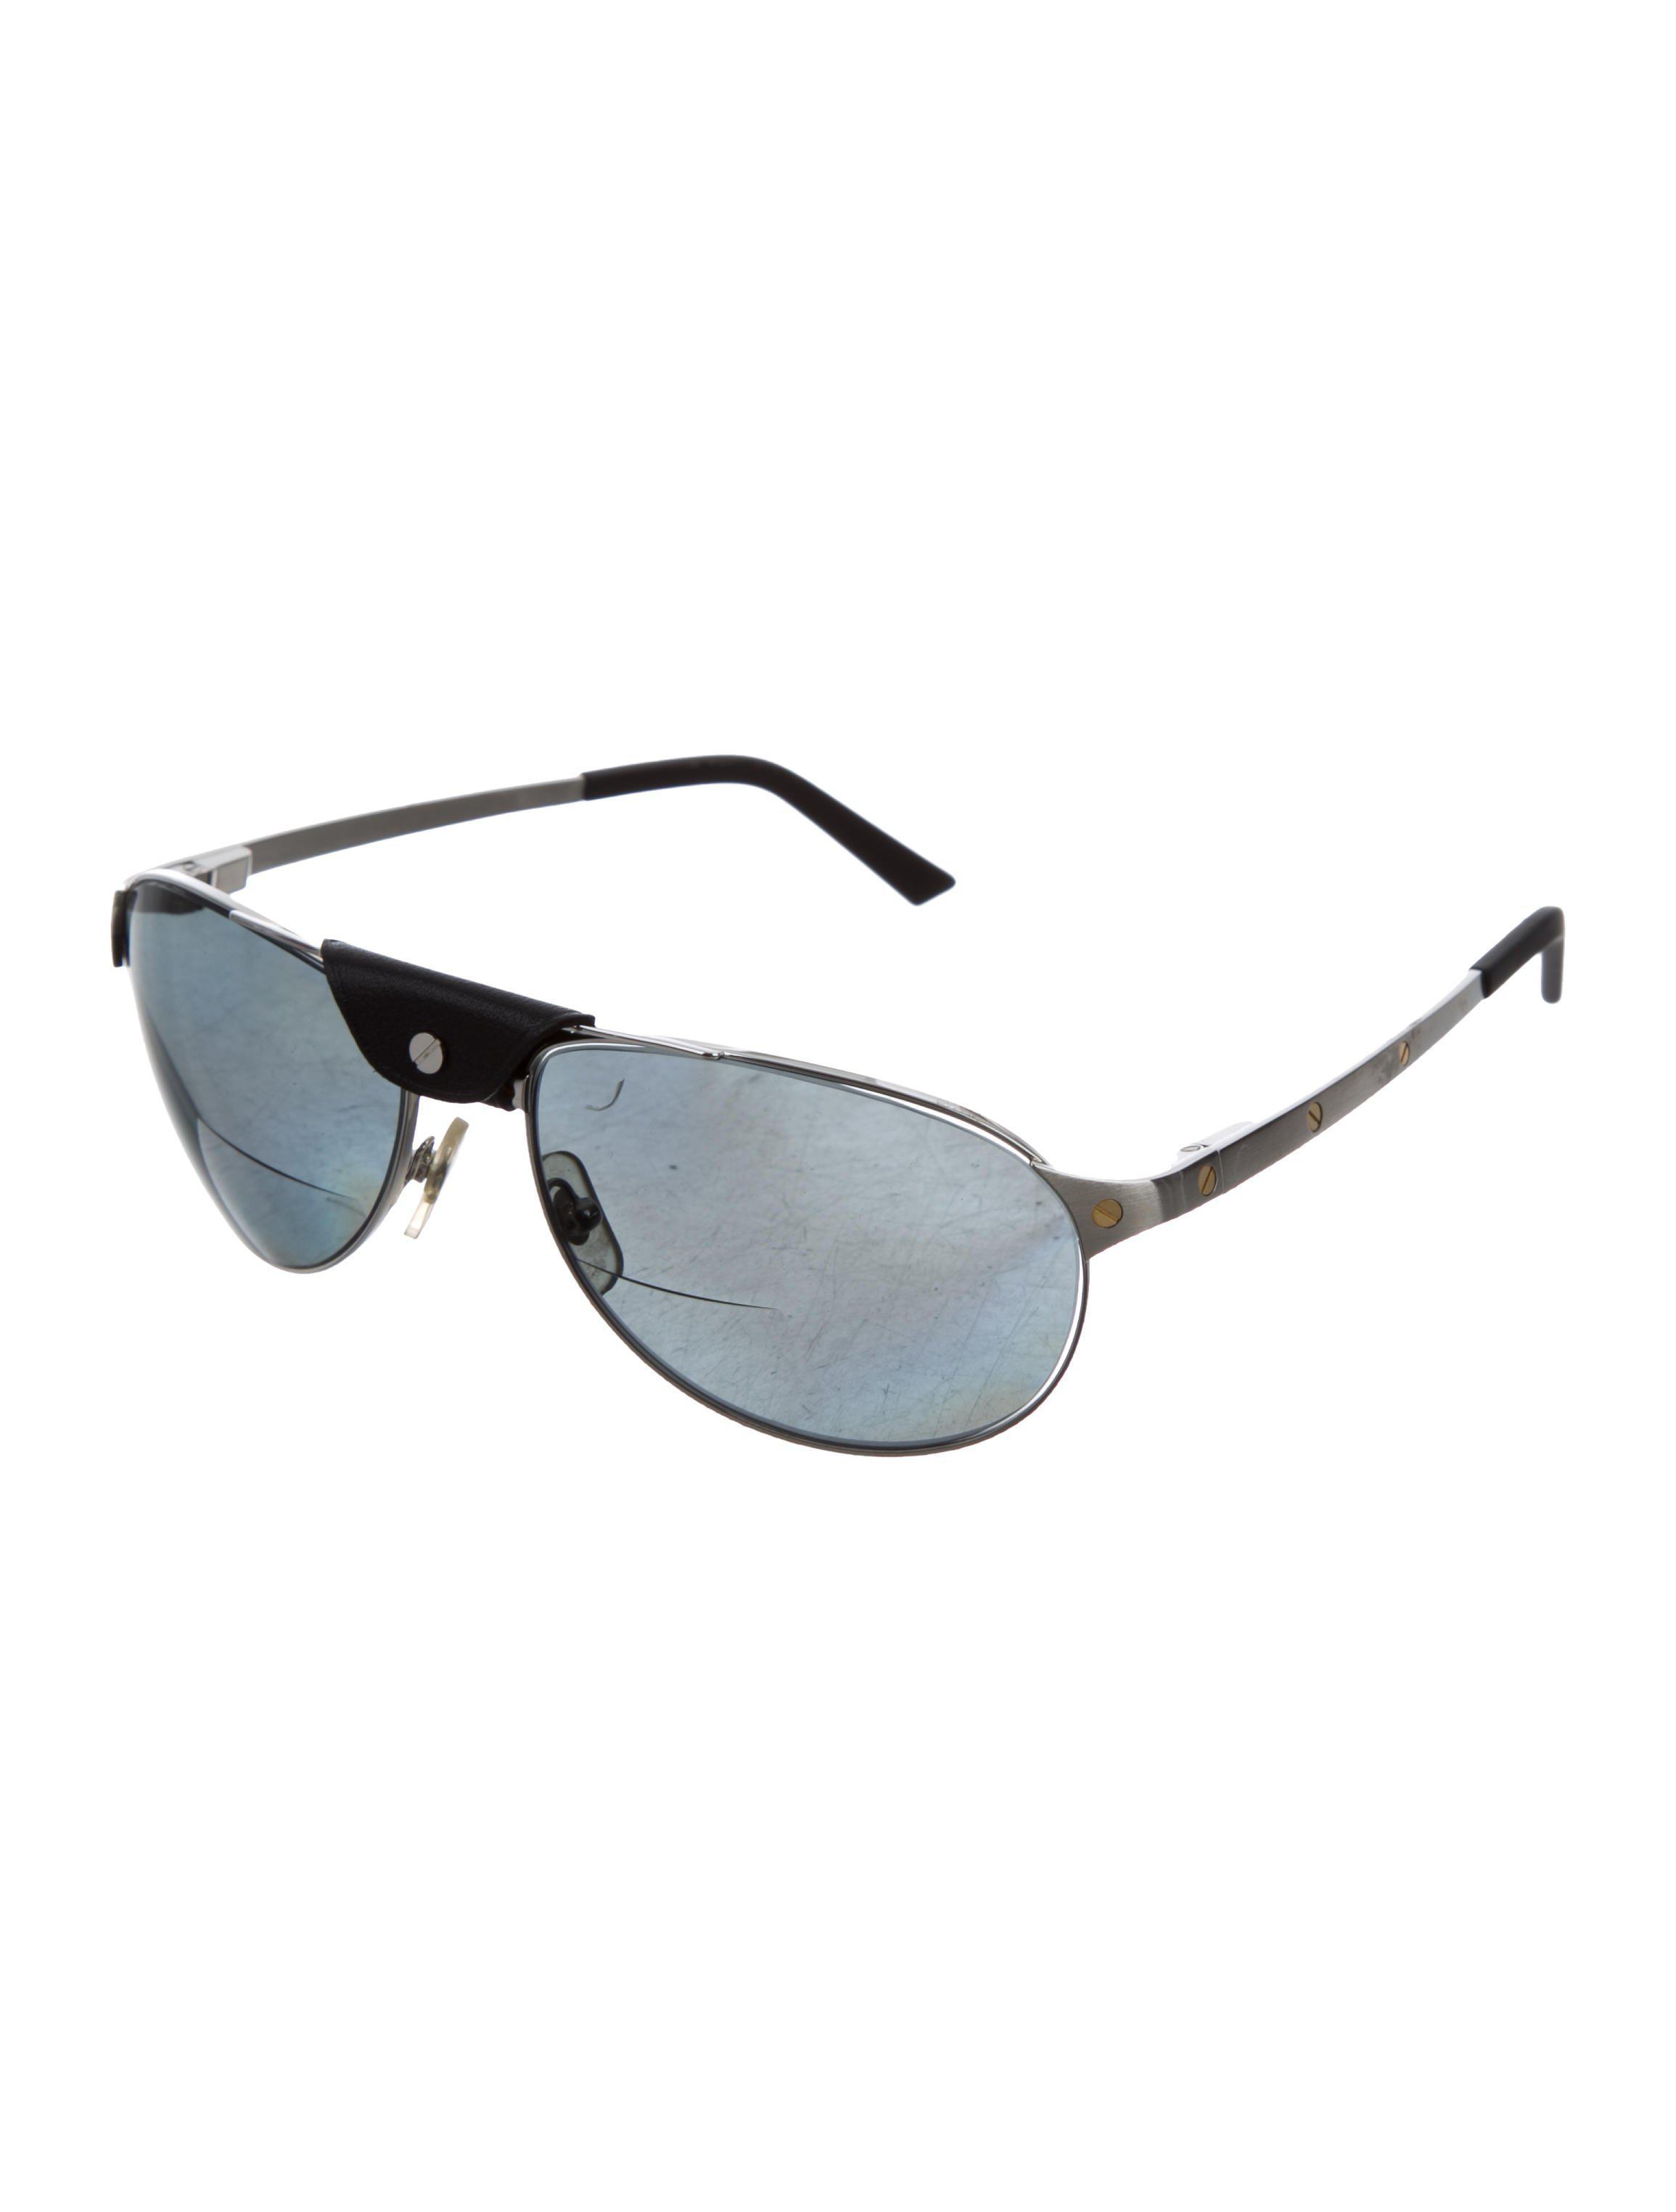 f04fcfc8d921 Lyst - Cartier Santos Dumont Polarized Aviator Sunglasses Silver in ...